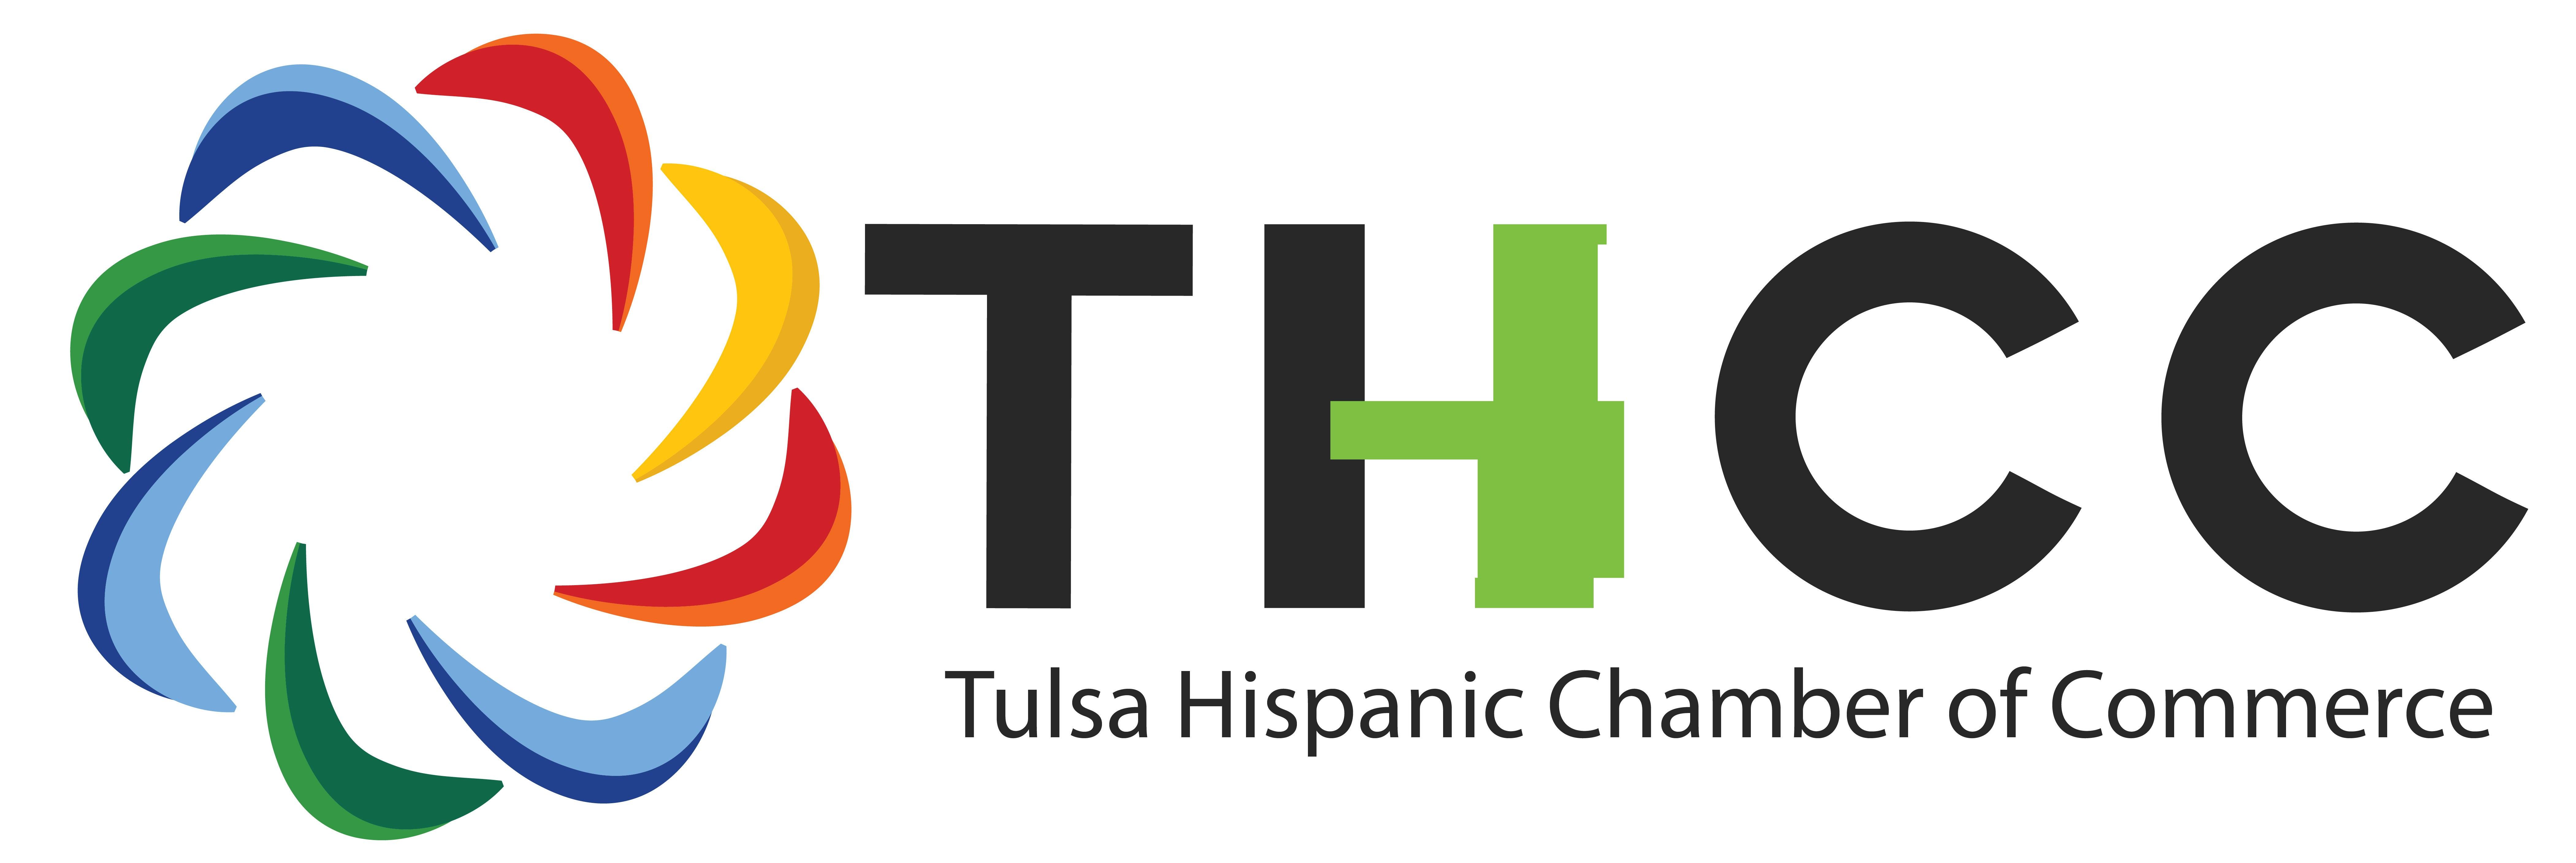 Tulsa hispanic